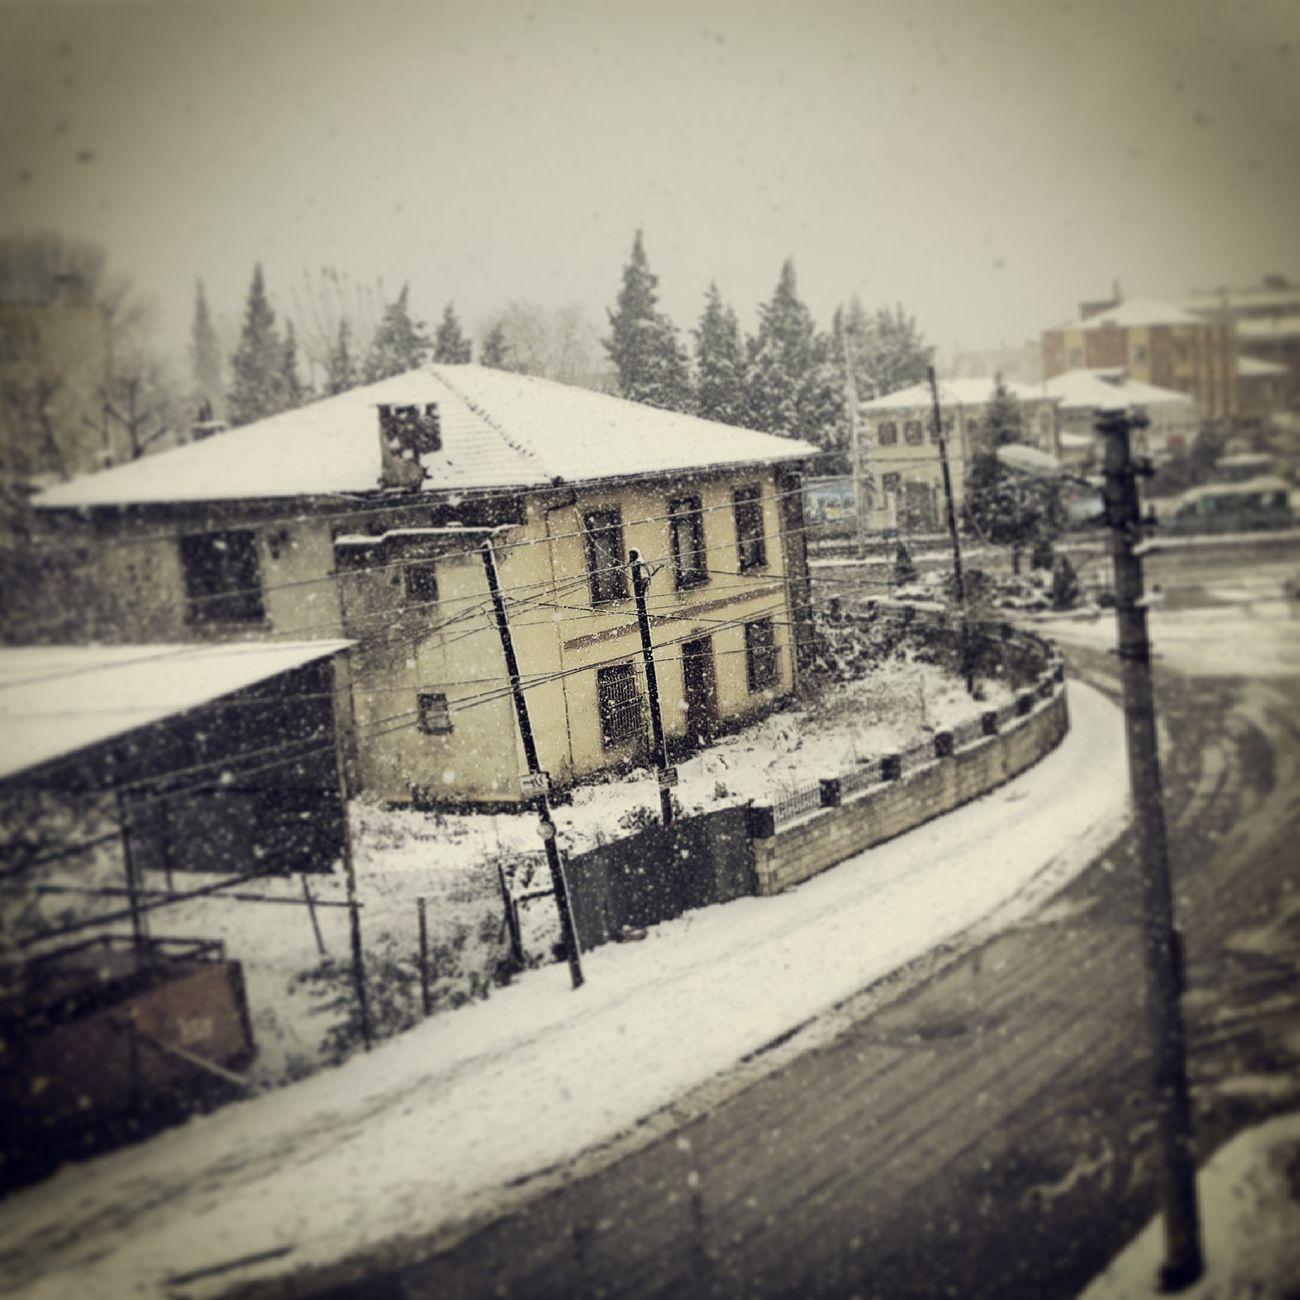 yurttan manzara :)